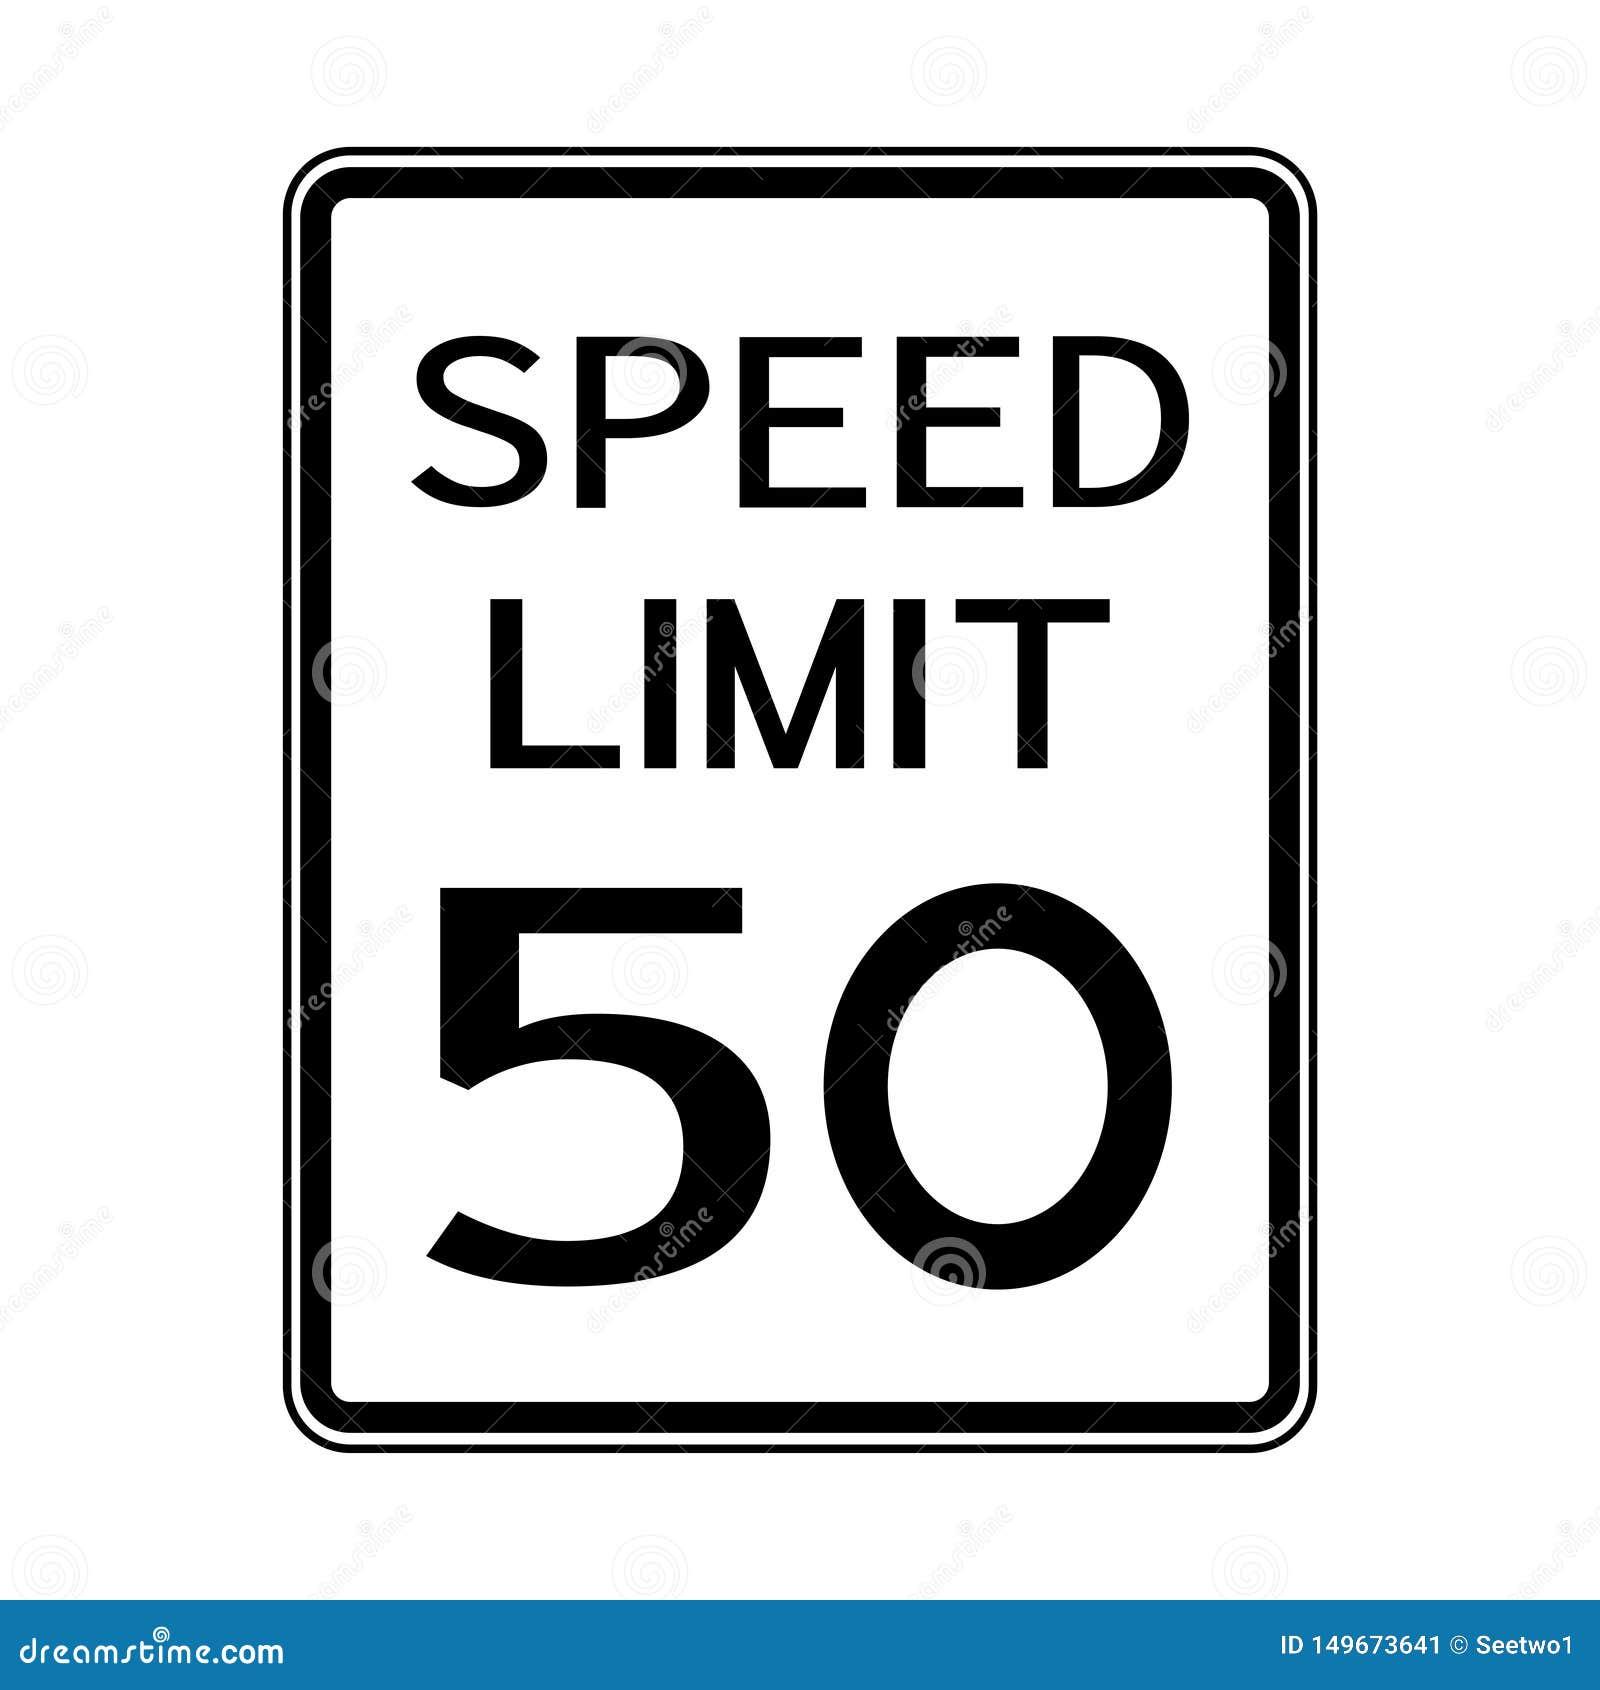 USA Road Traffic Transportation Sign: Speed Limit 50 On White Background,Vector Illustration